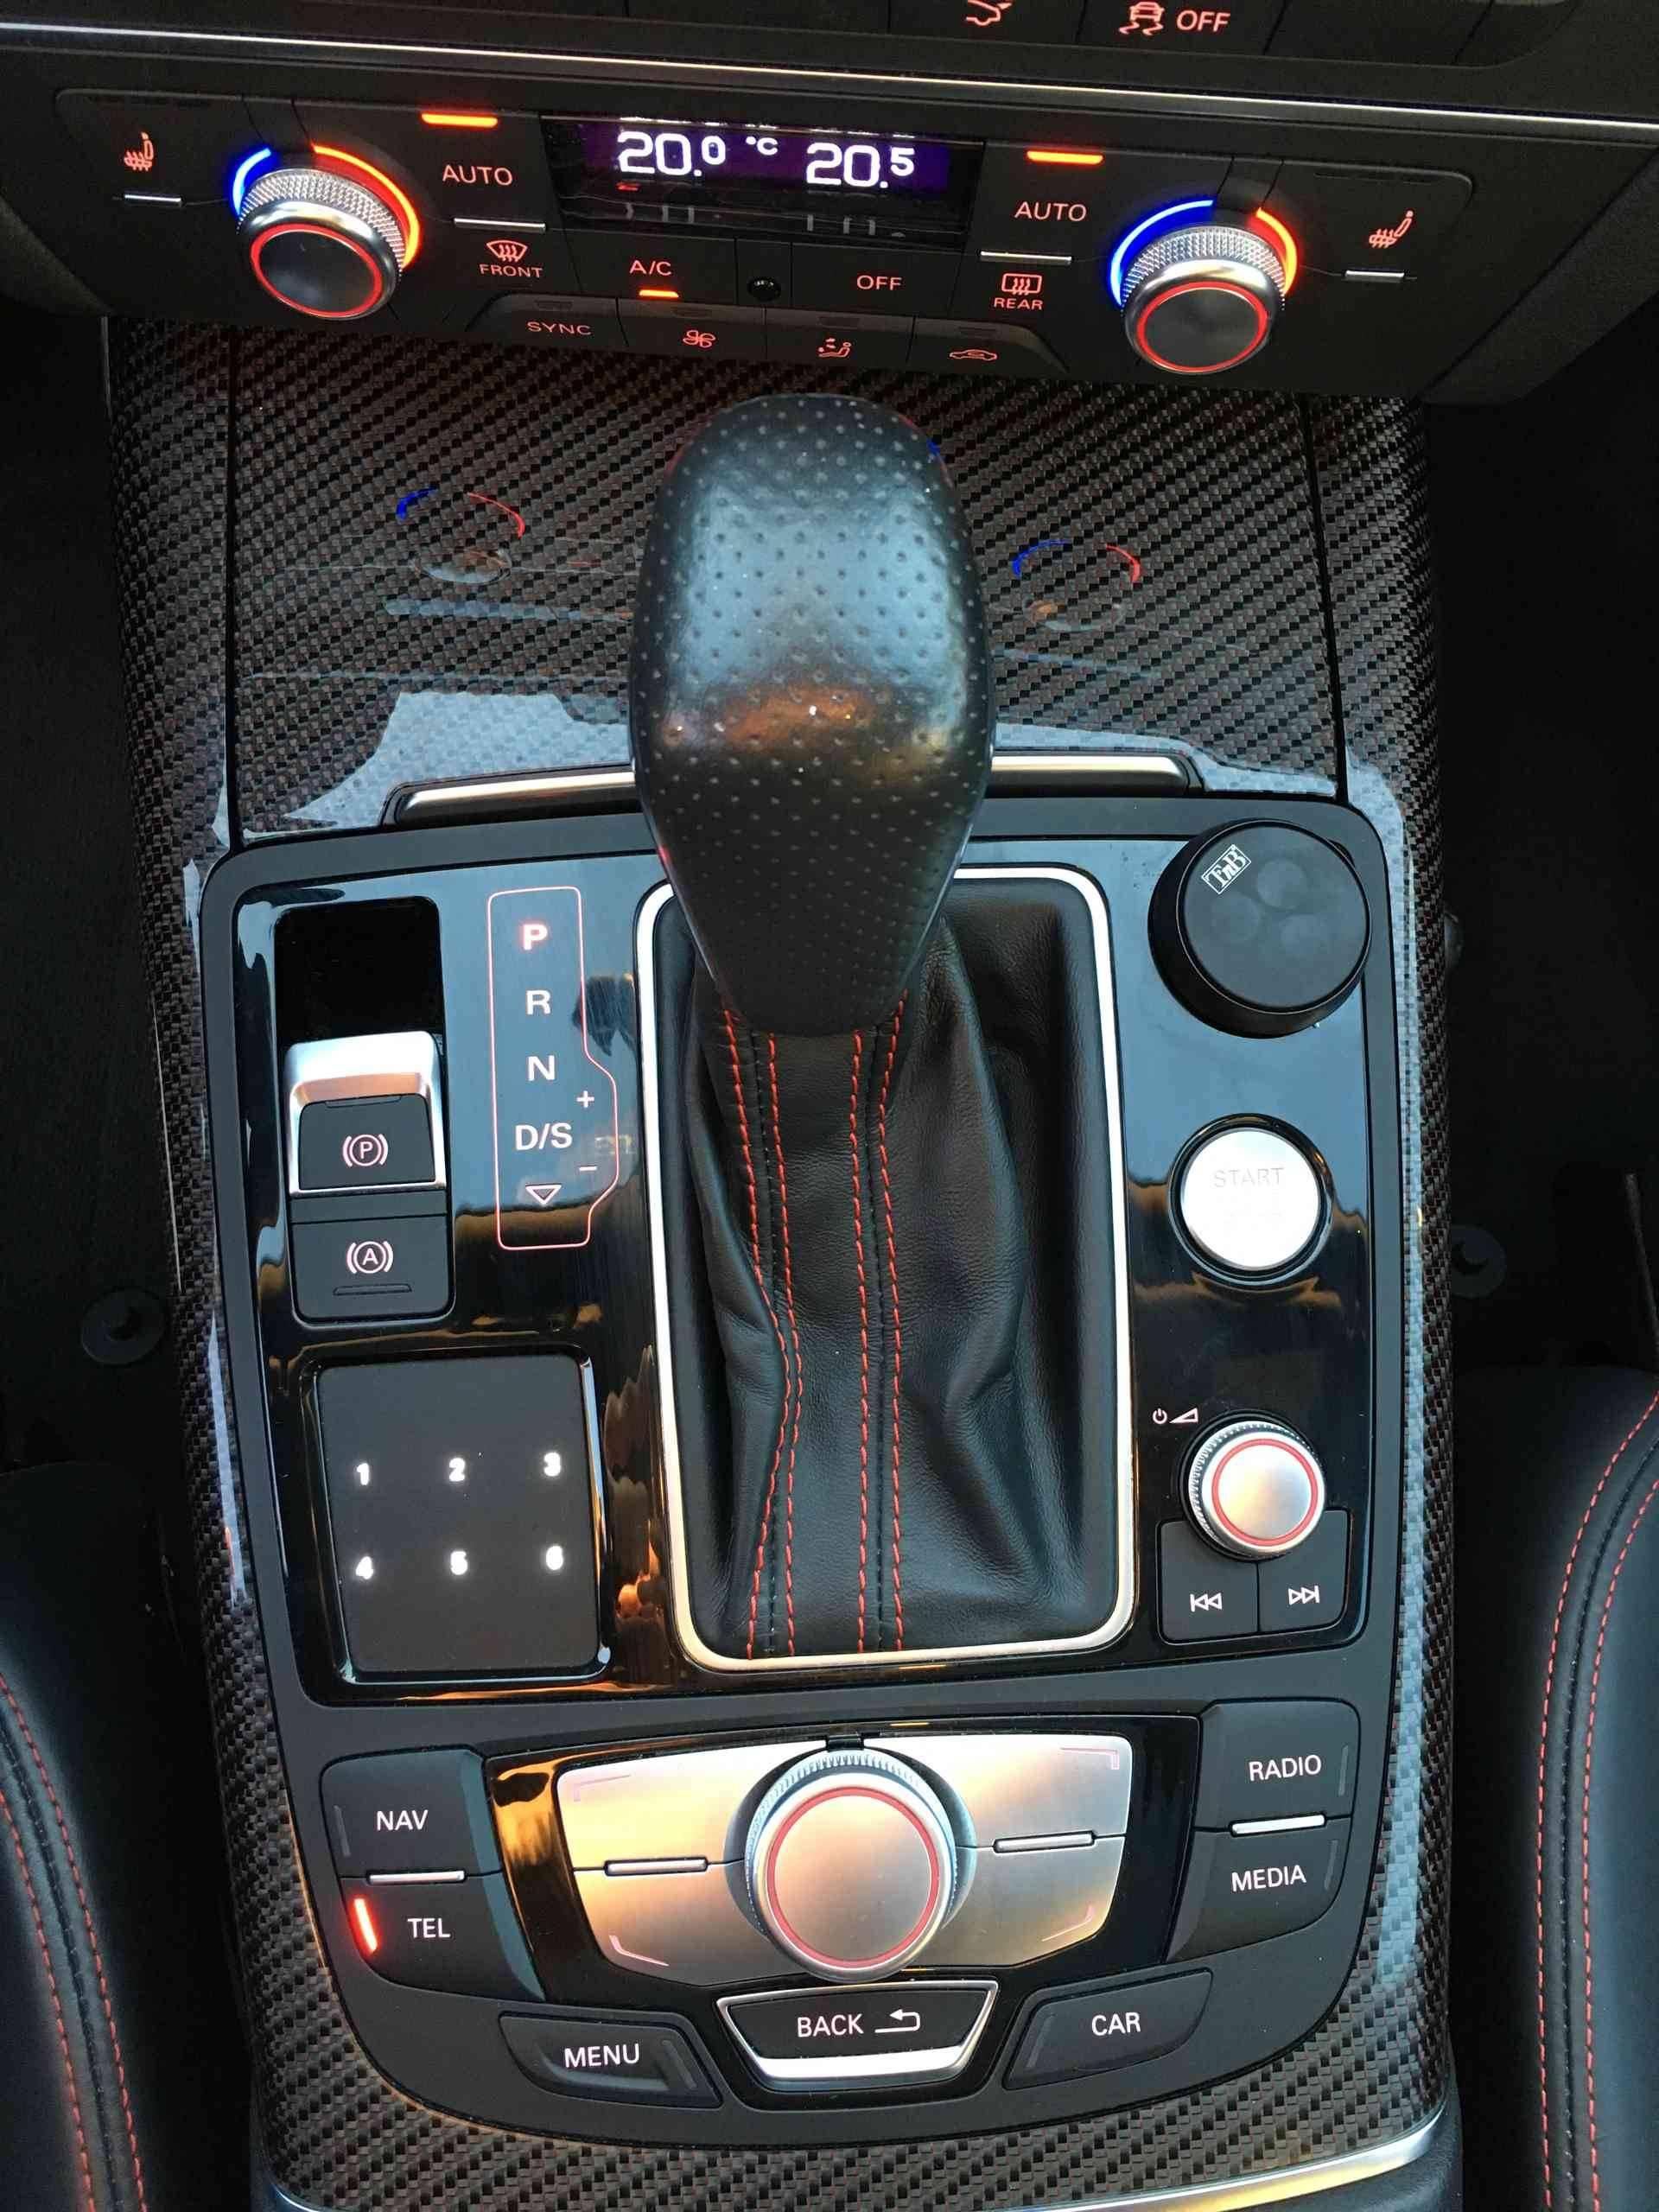 A7 Sportback V6 3.0 BiTDI 326 Tiptronic 8 Quattro